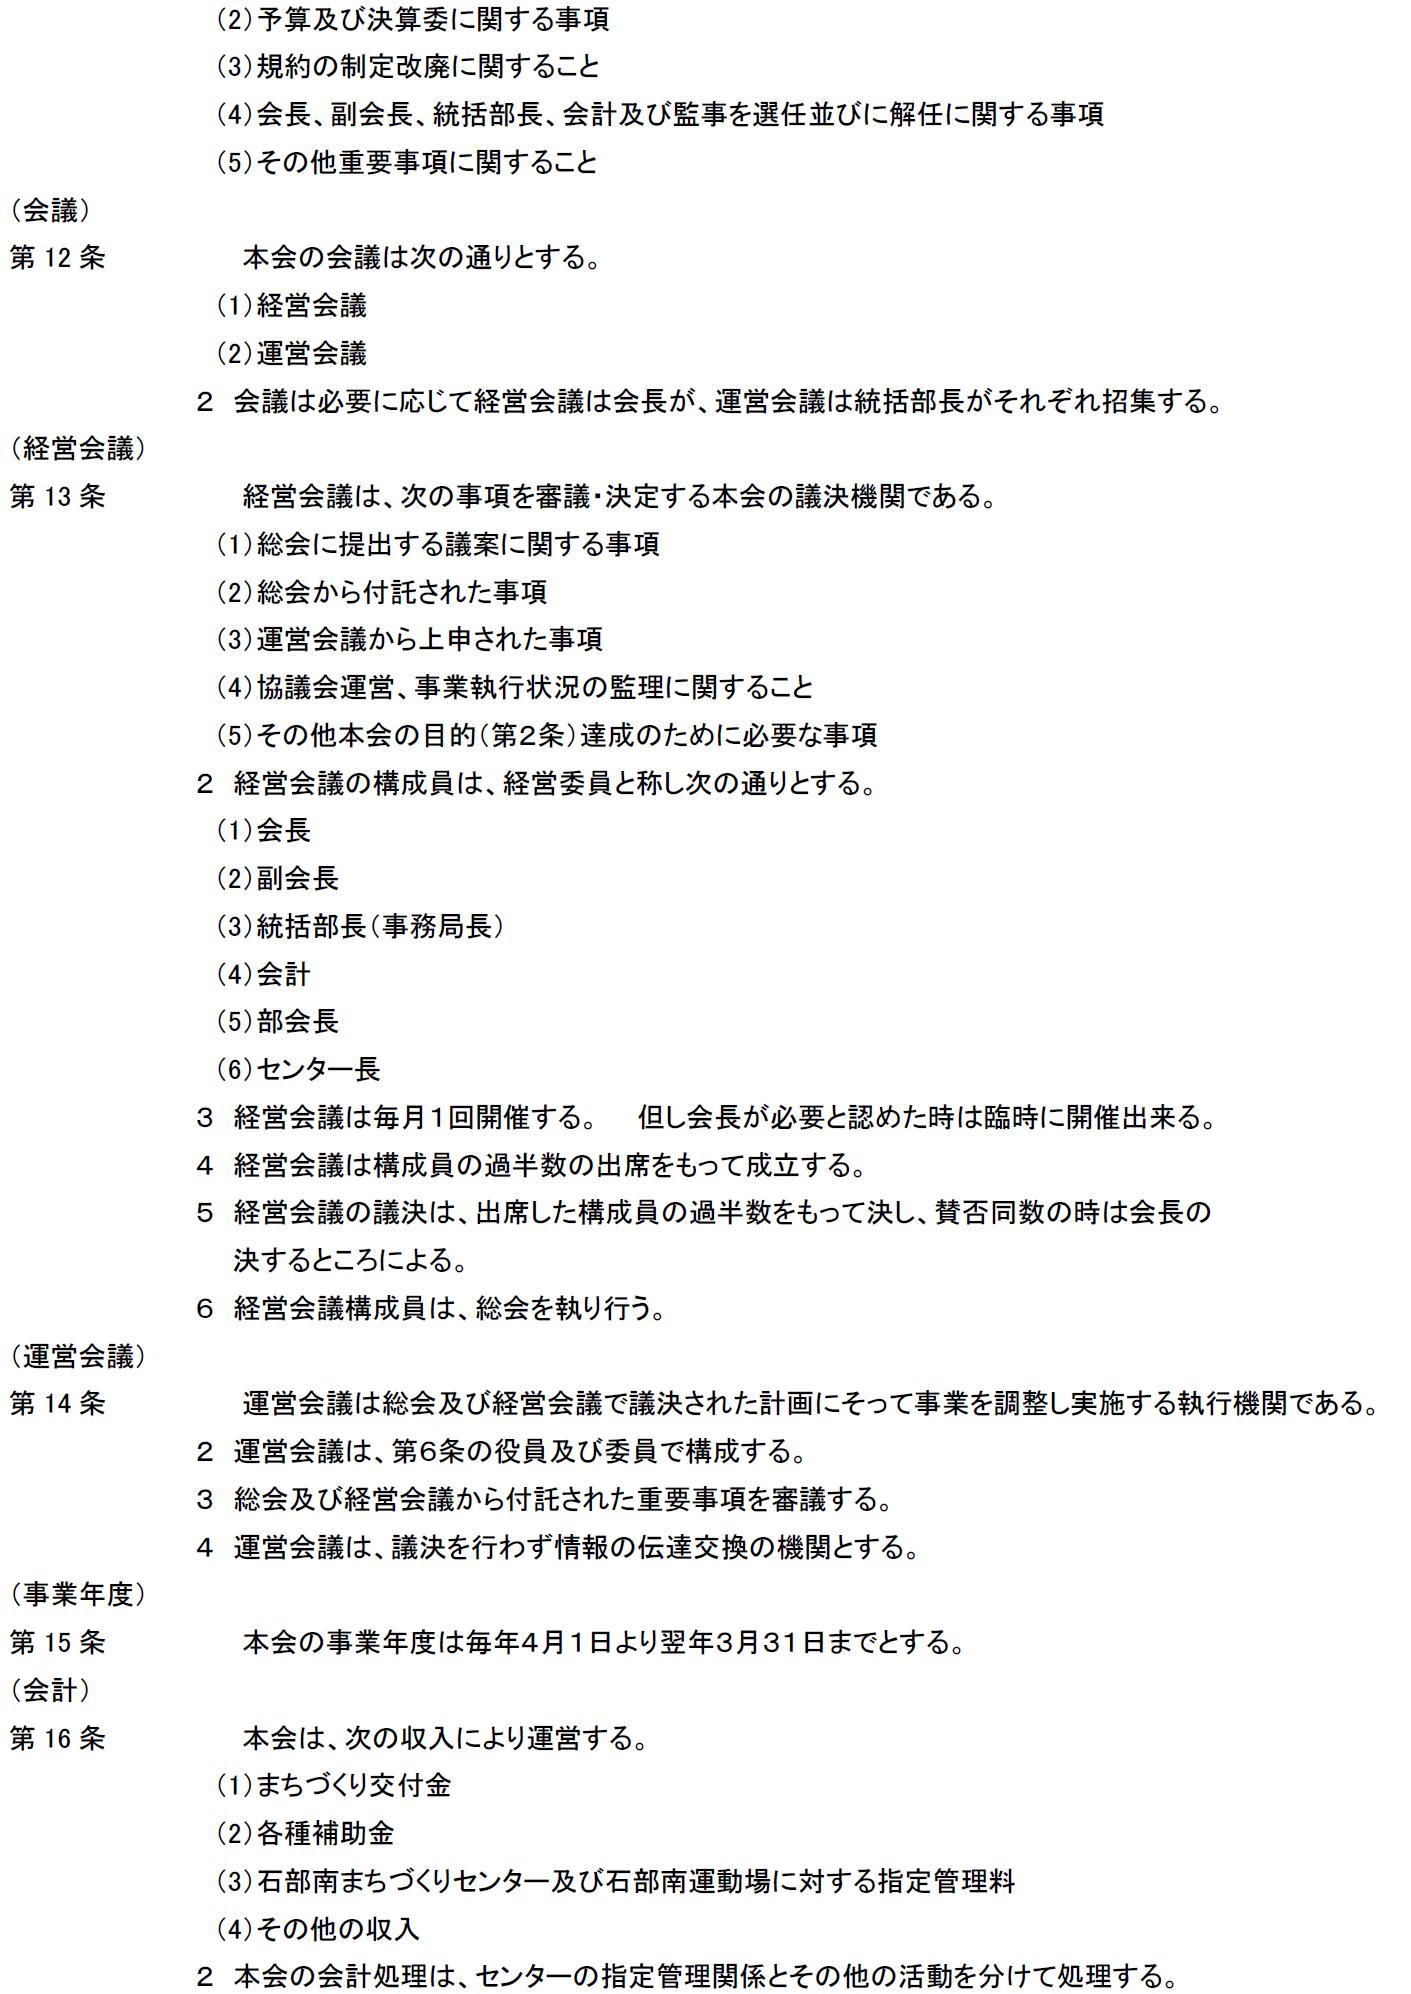 kiyaku20150501-3